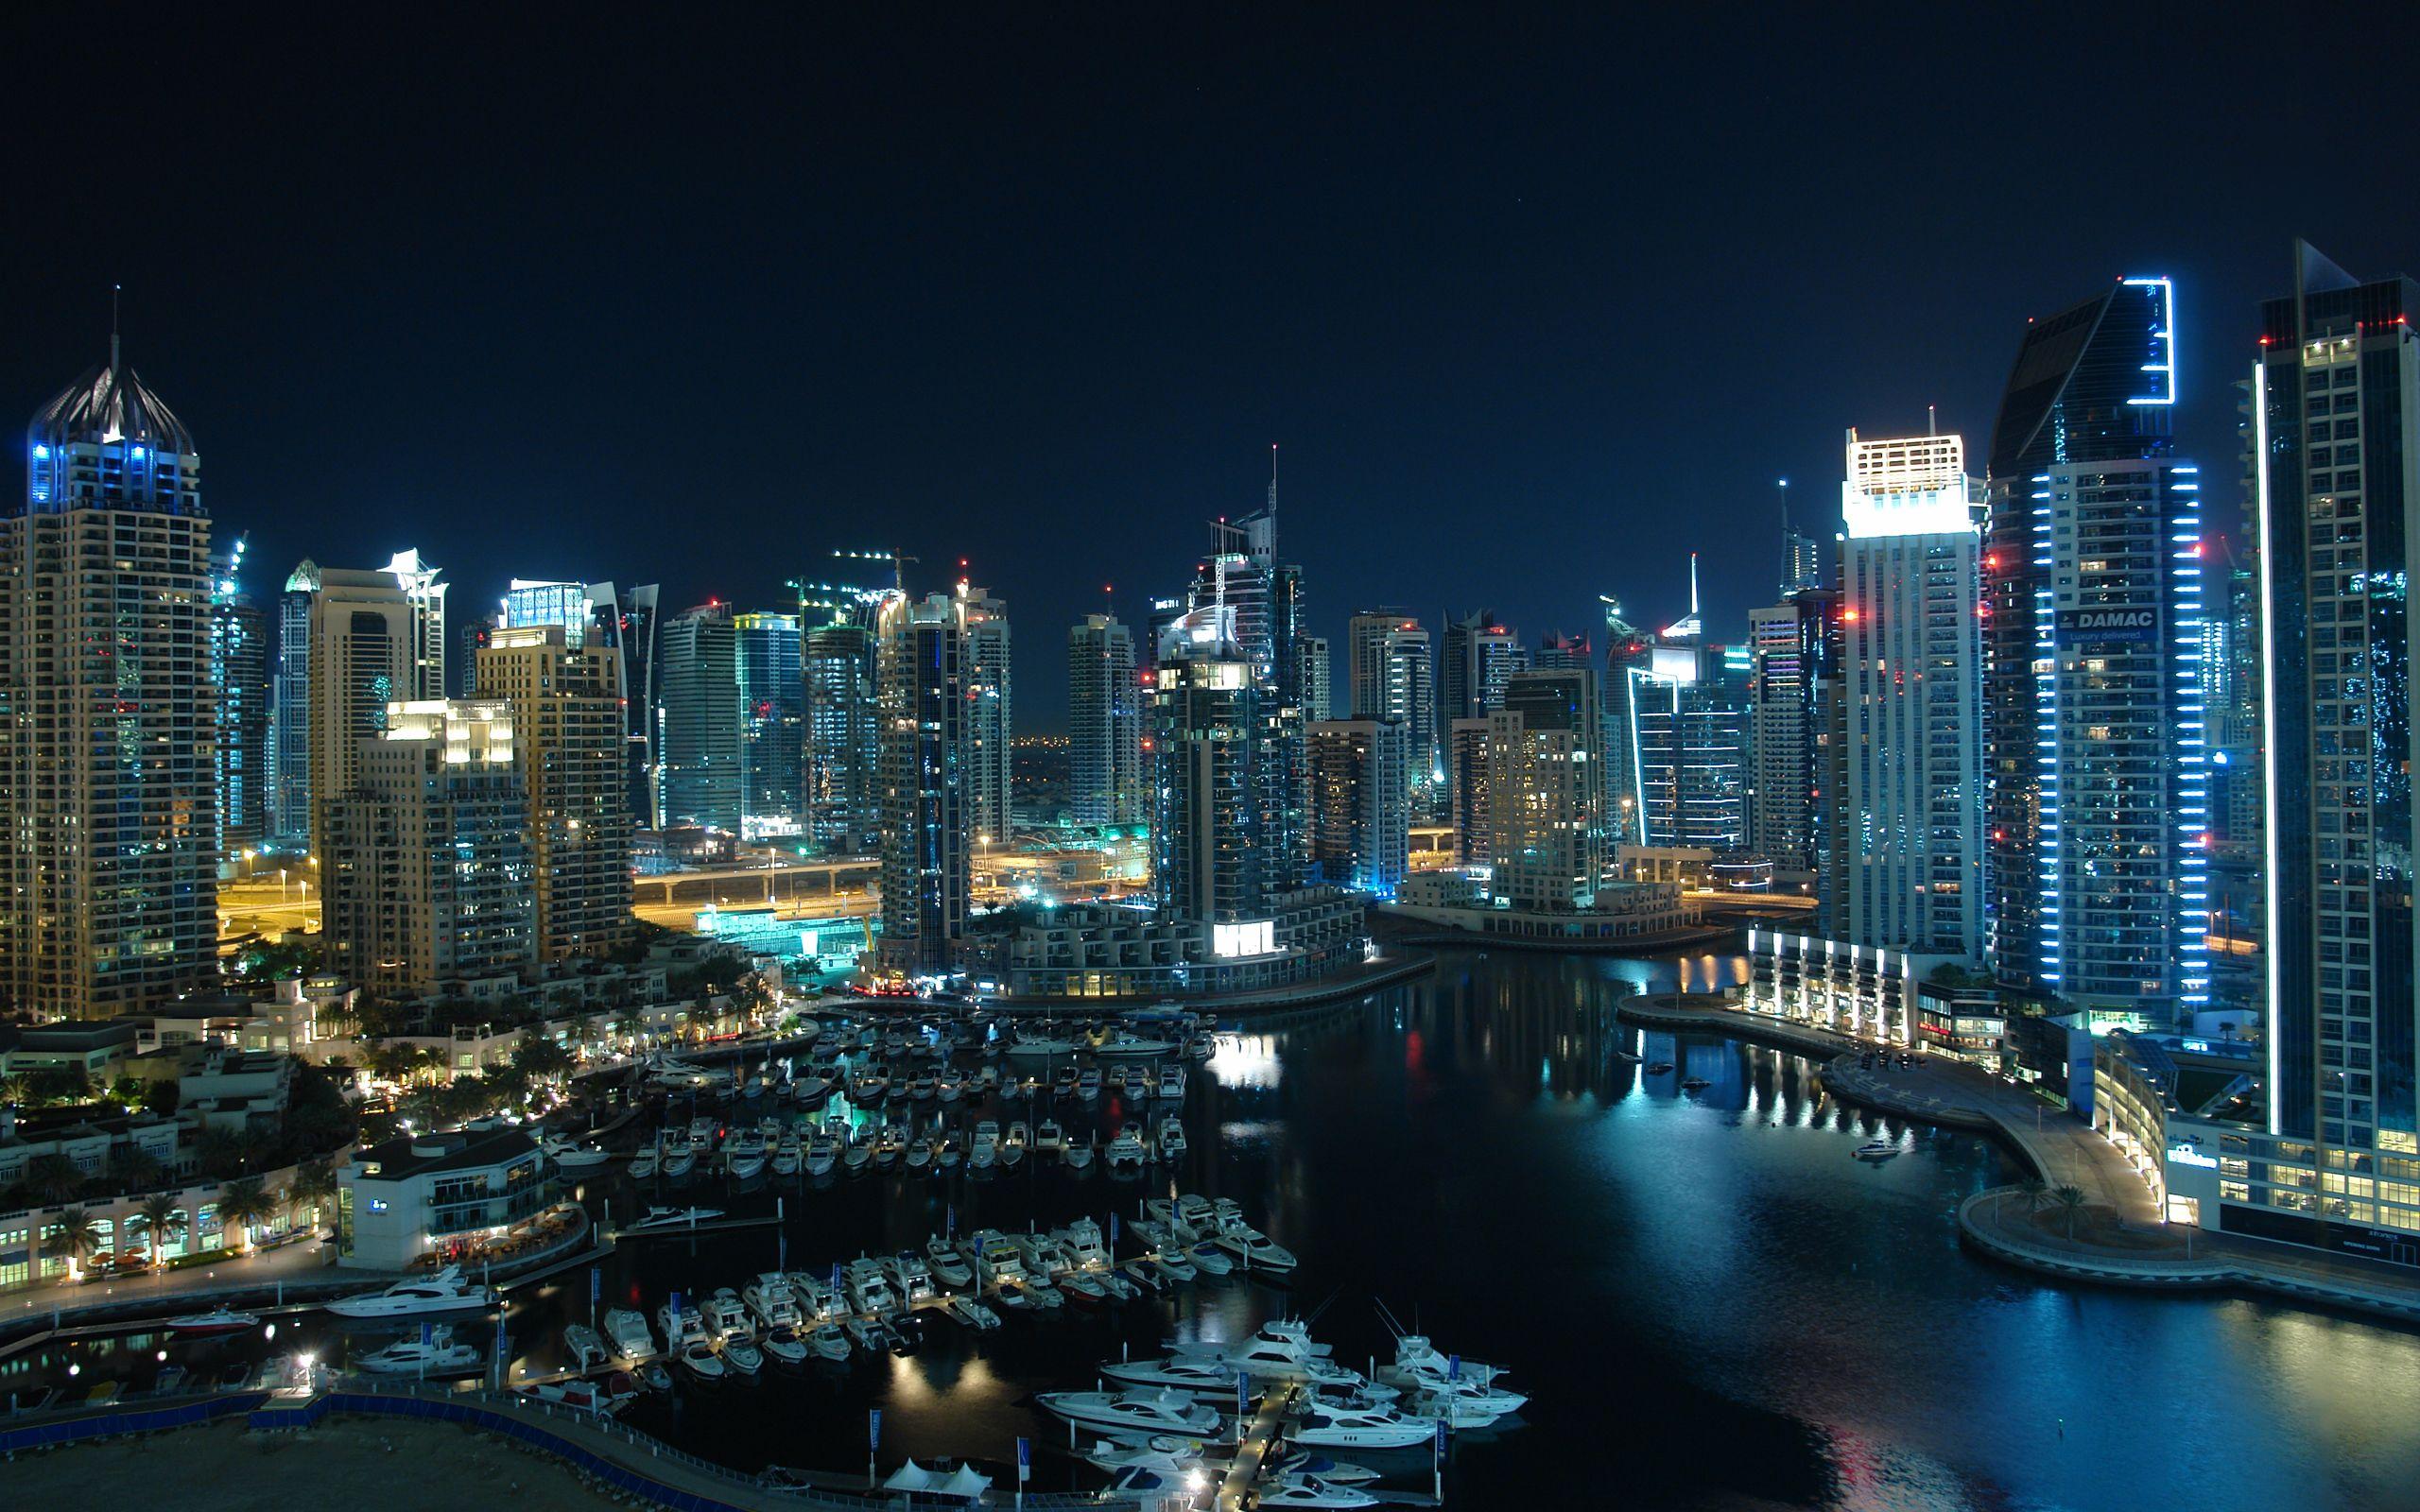 Dubai At Night Dubai Buildings Dubai City City Wallpaper